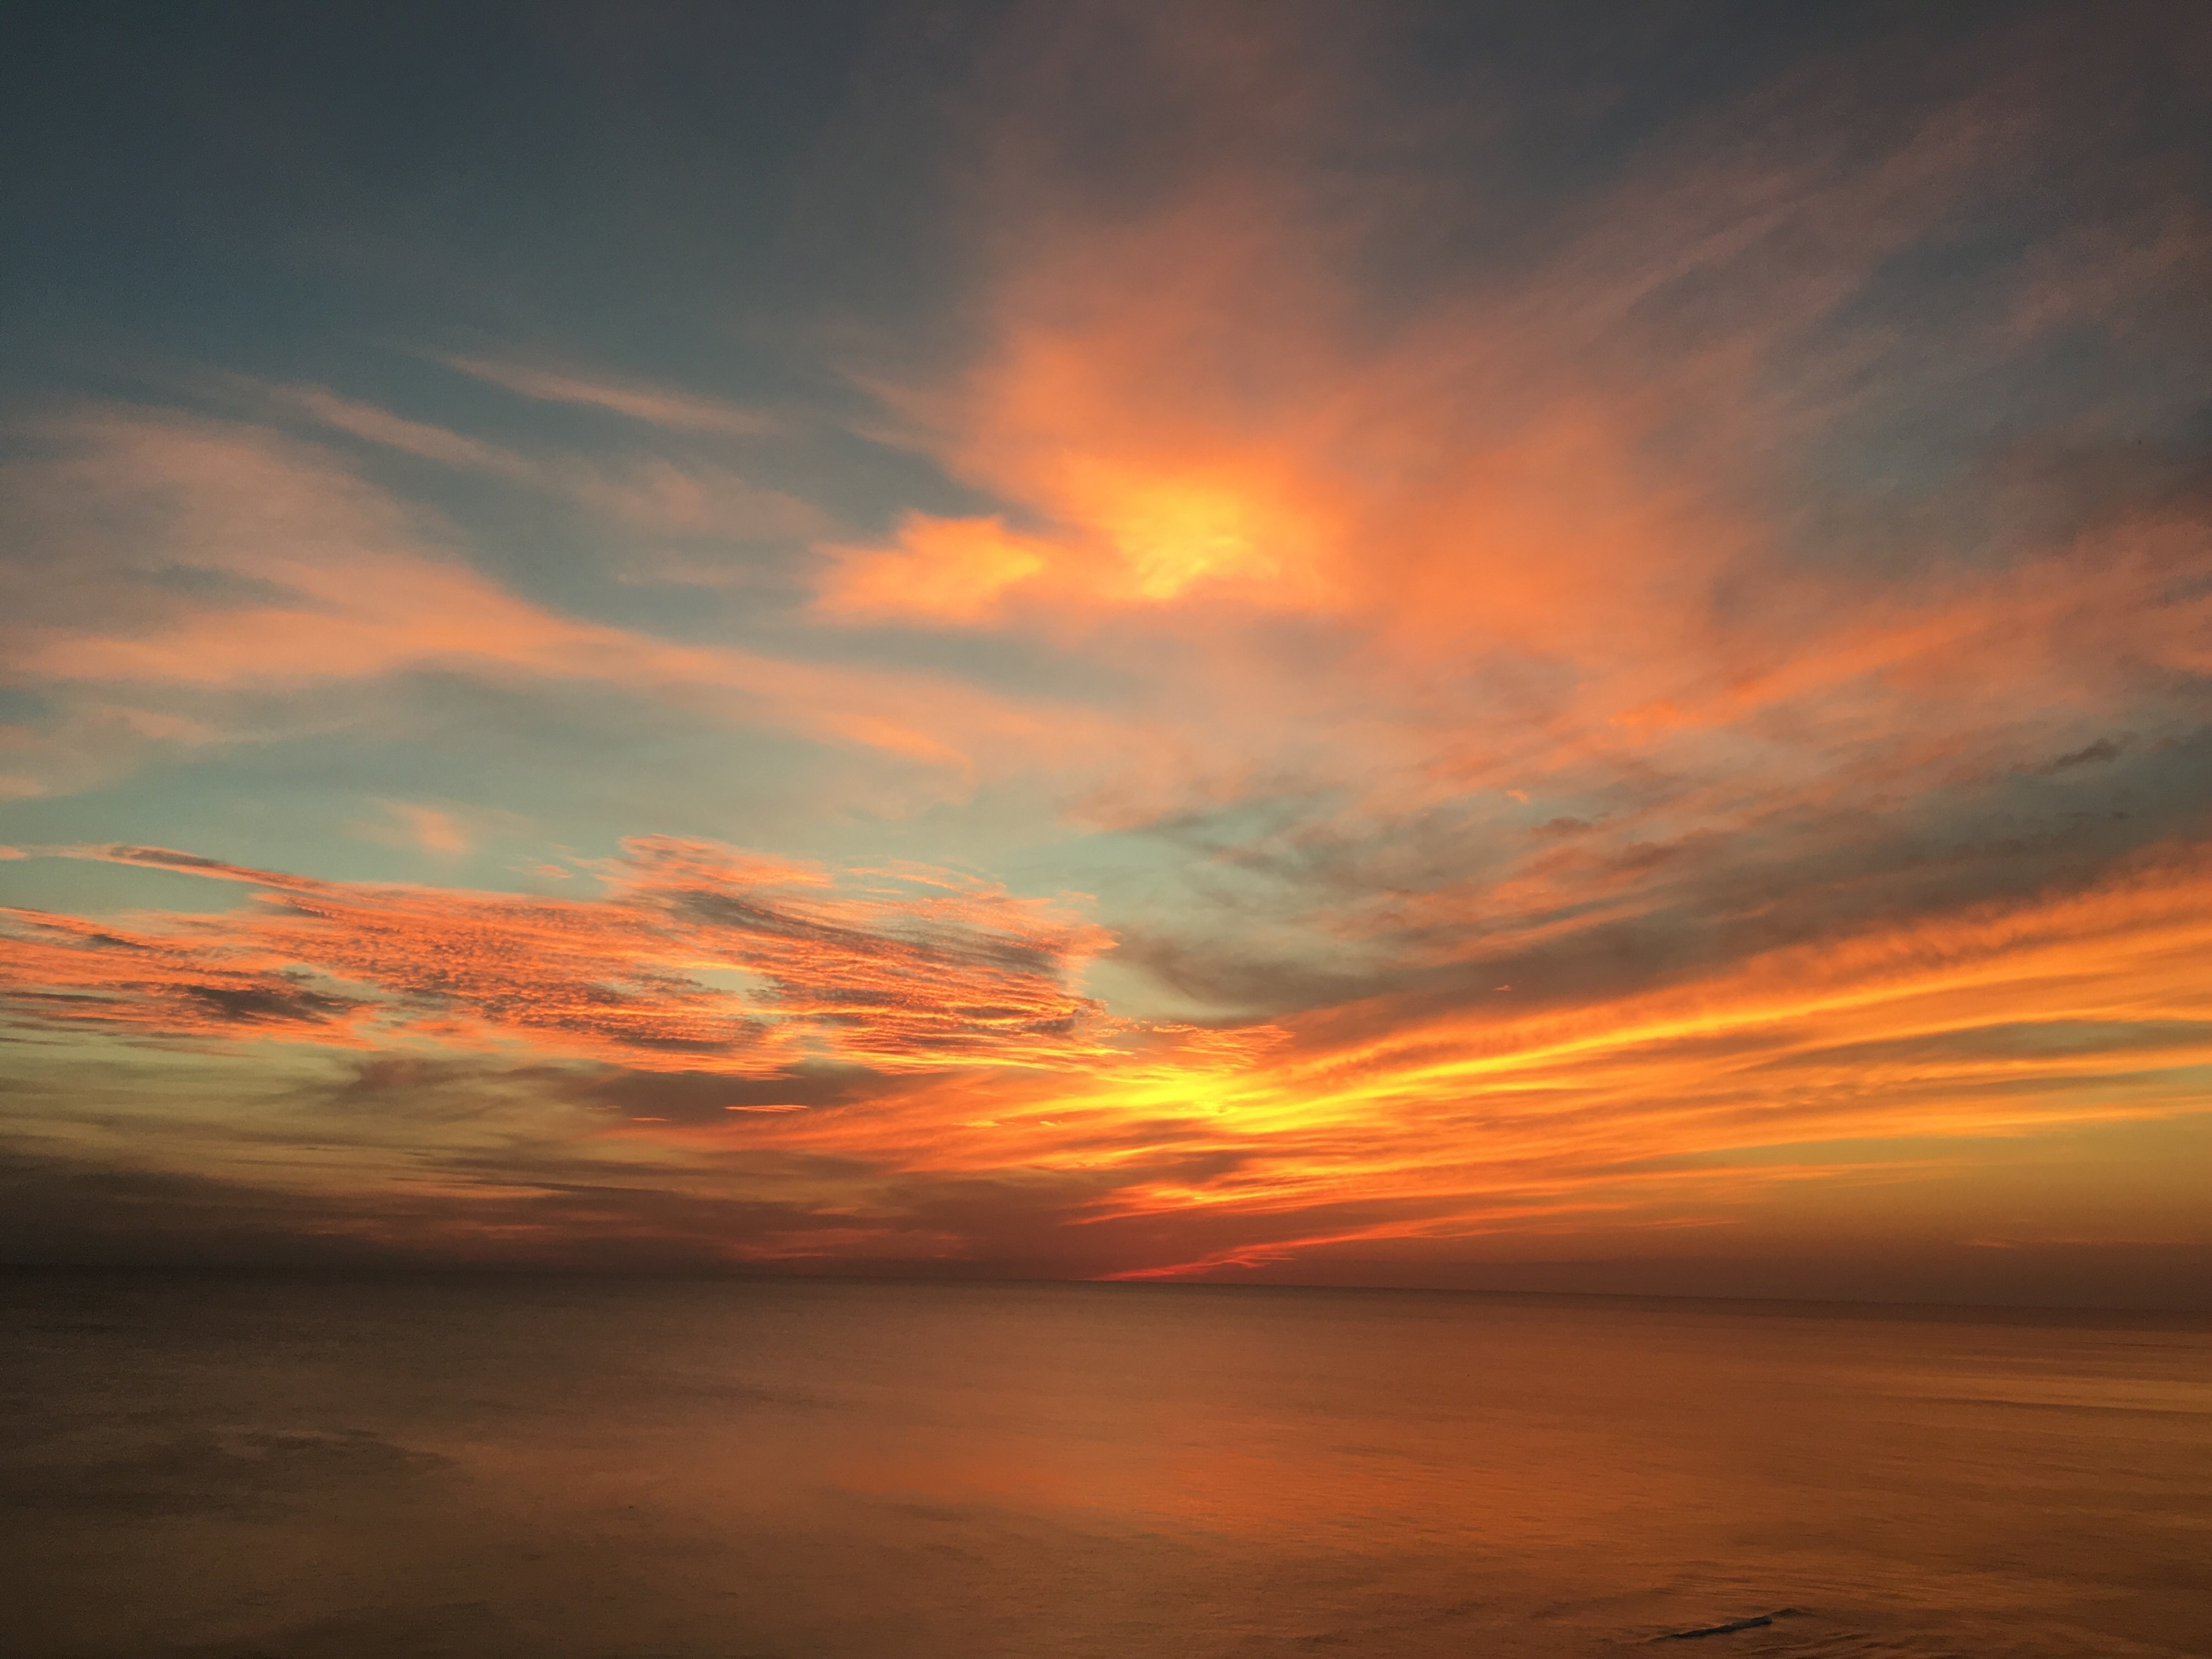 Emerald Beach Resort, Panama City Beach, Florida, United States of America